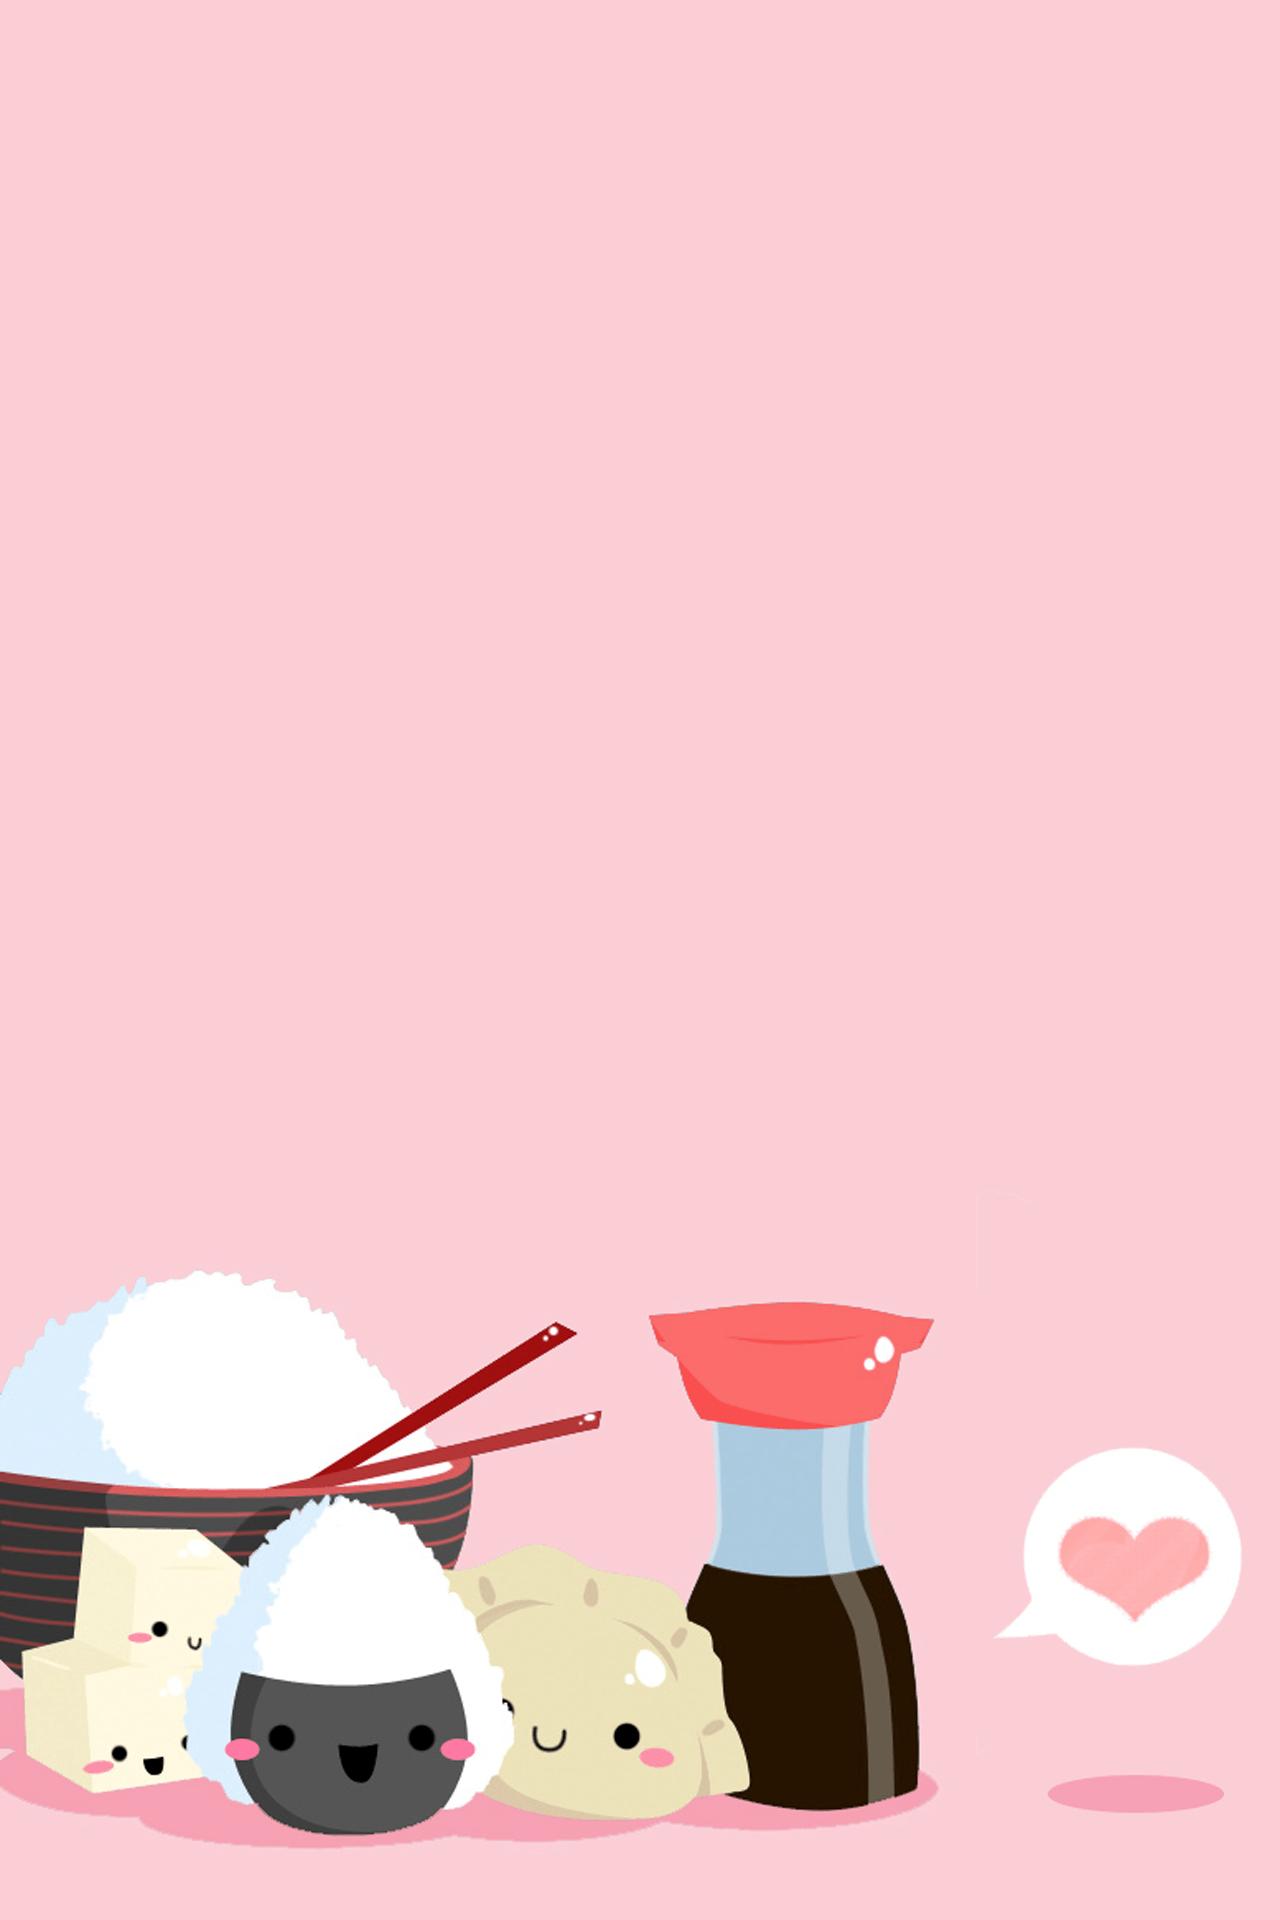 Onigiri Cute Wallpaper Kawaii Iphone Wallpapers Pixelstalk Net